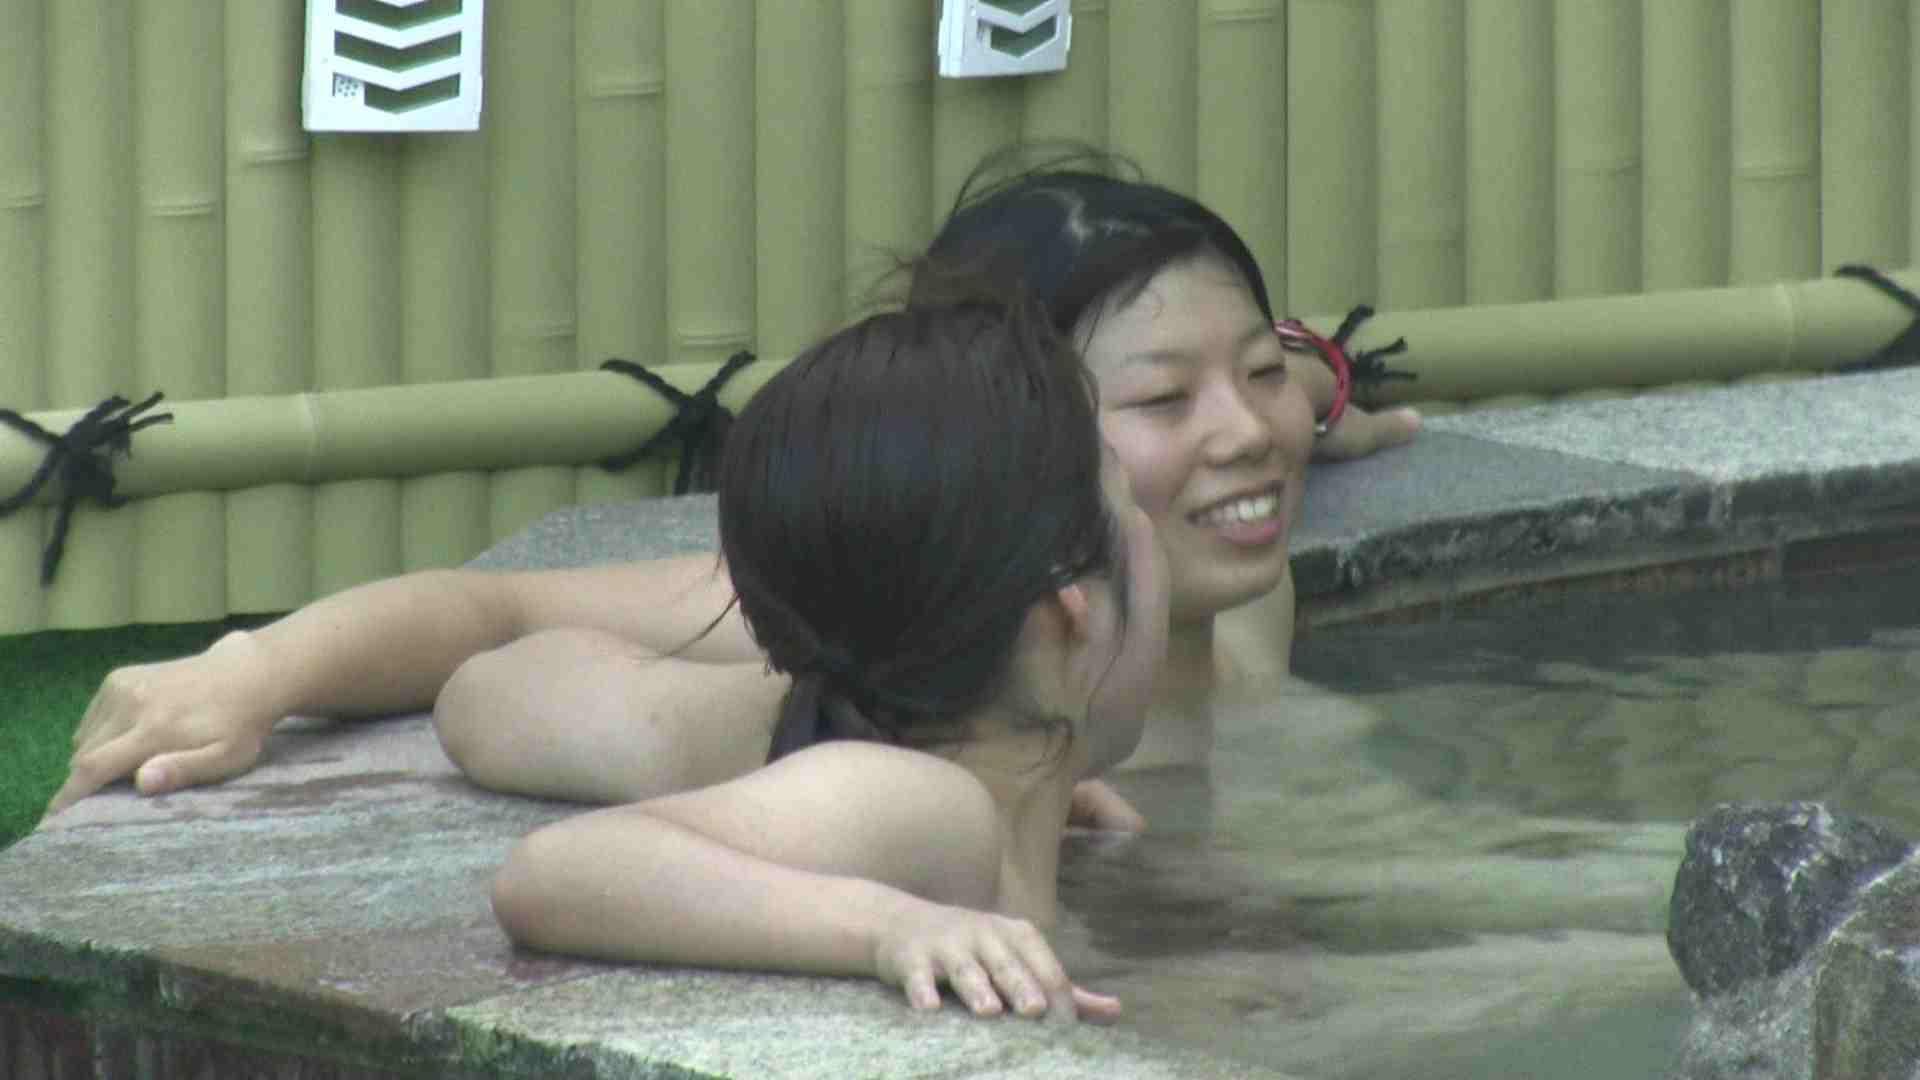 Aquaな露天風呂Vol.182 盗撮 盗み撮り動画キャプチャ 80画像 17